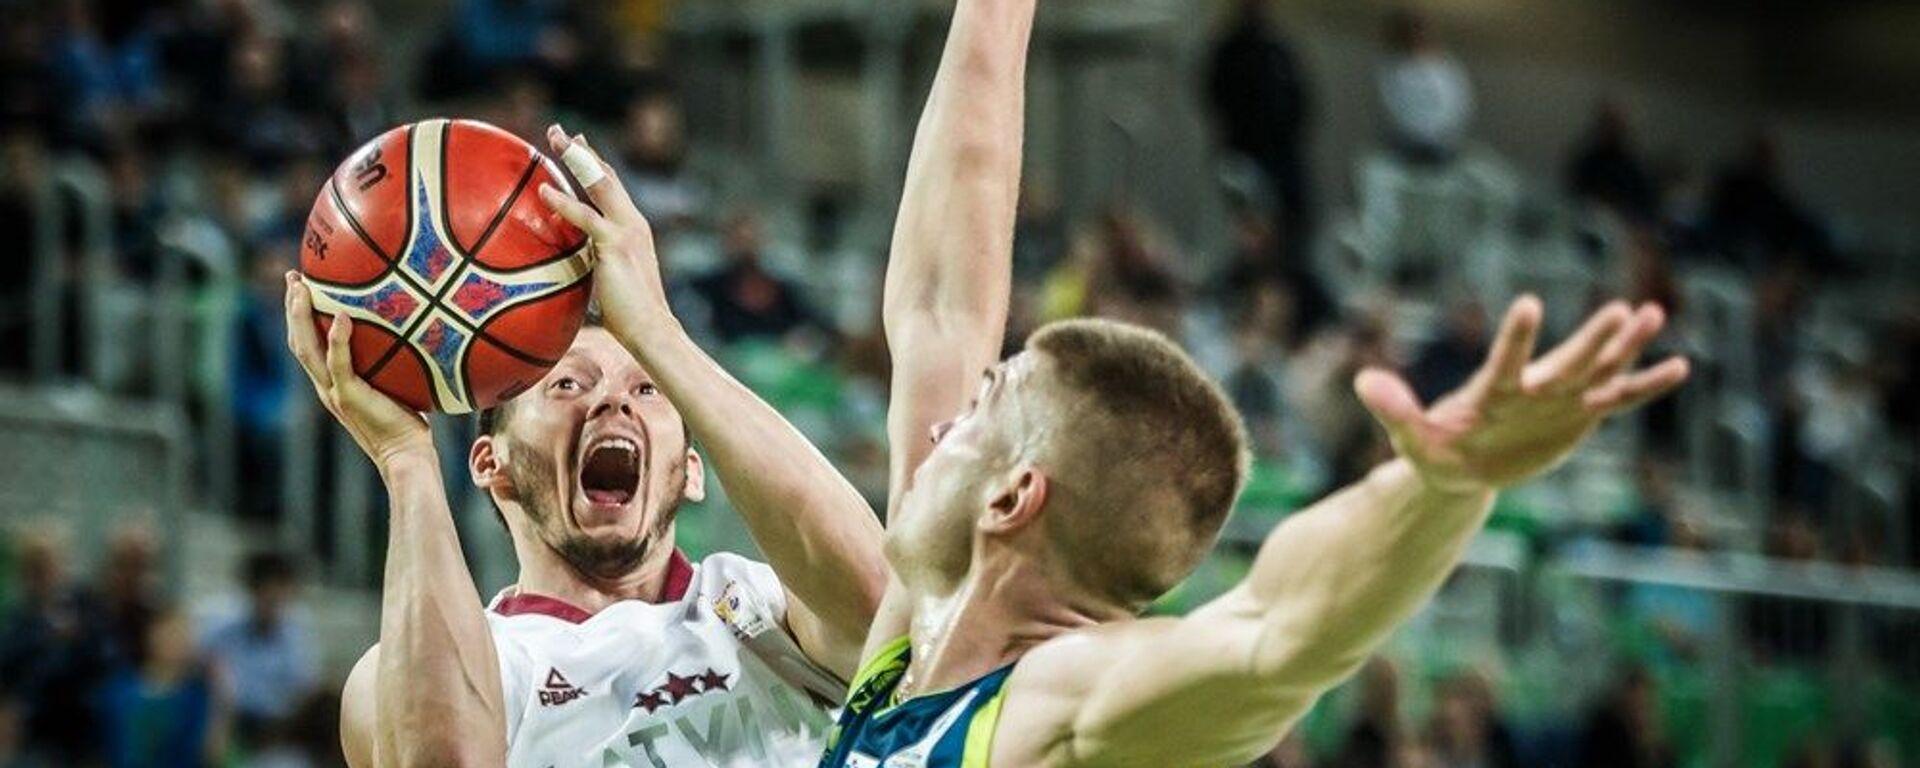 Латвийский баскетболист Янис Блумс (слева) - Sputnik Латвия, 1920, 30.08.2021